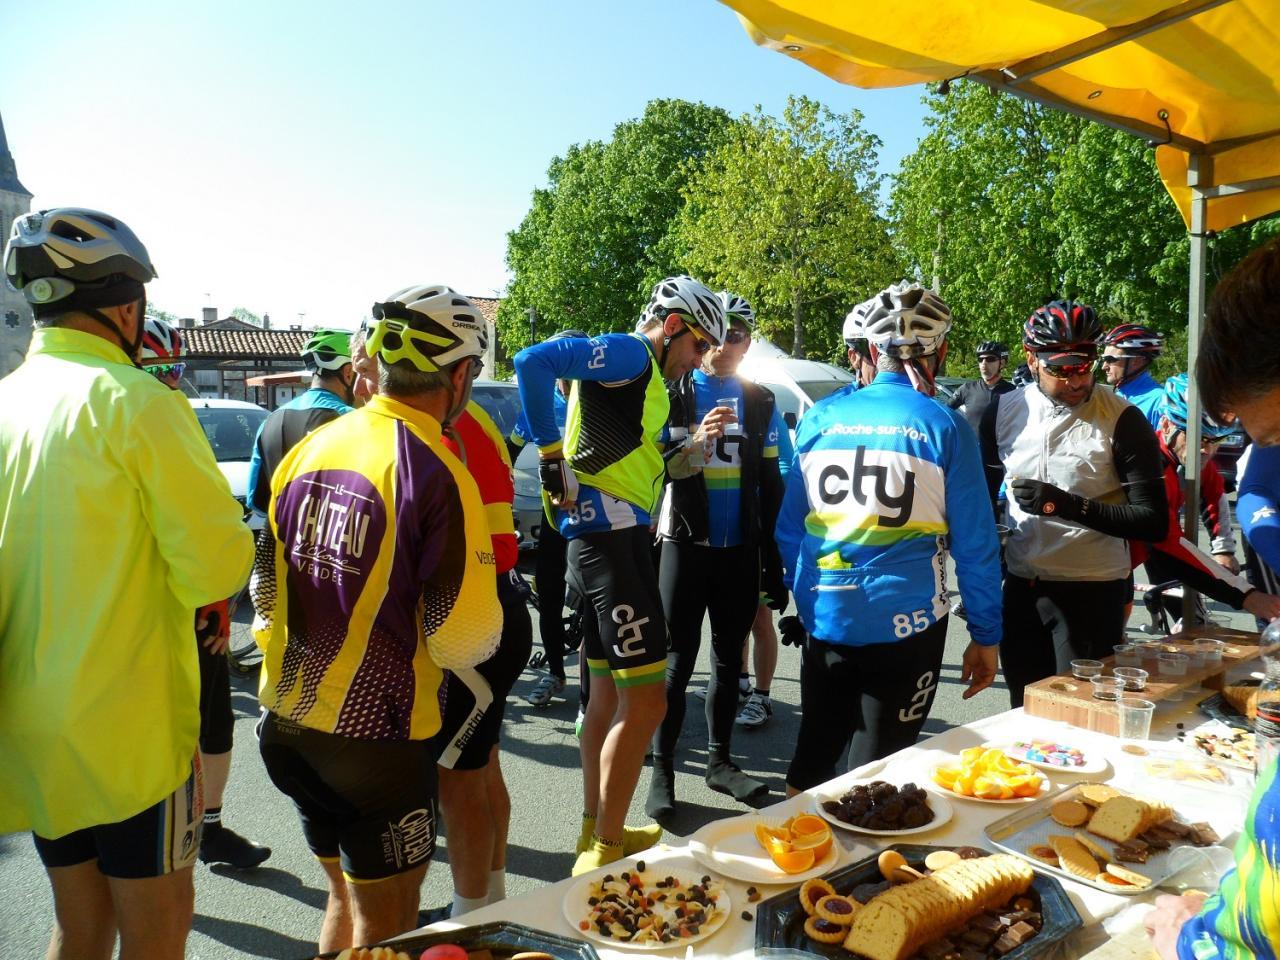 20170423_Ravitaillement Cyclo de Saligny_69